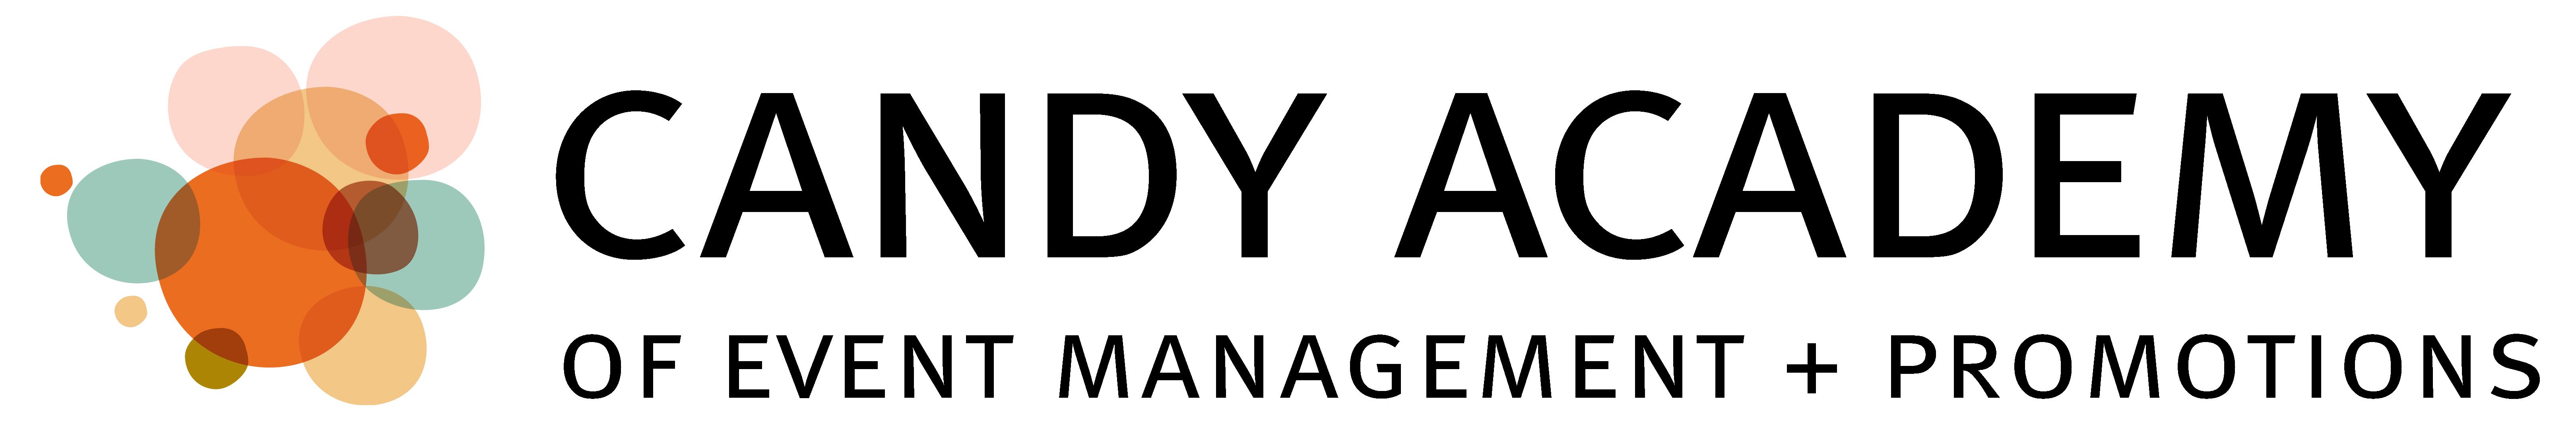 Candy Academy Logo